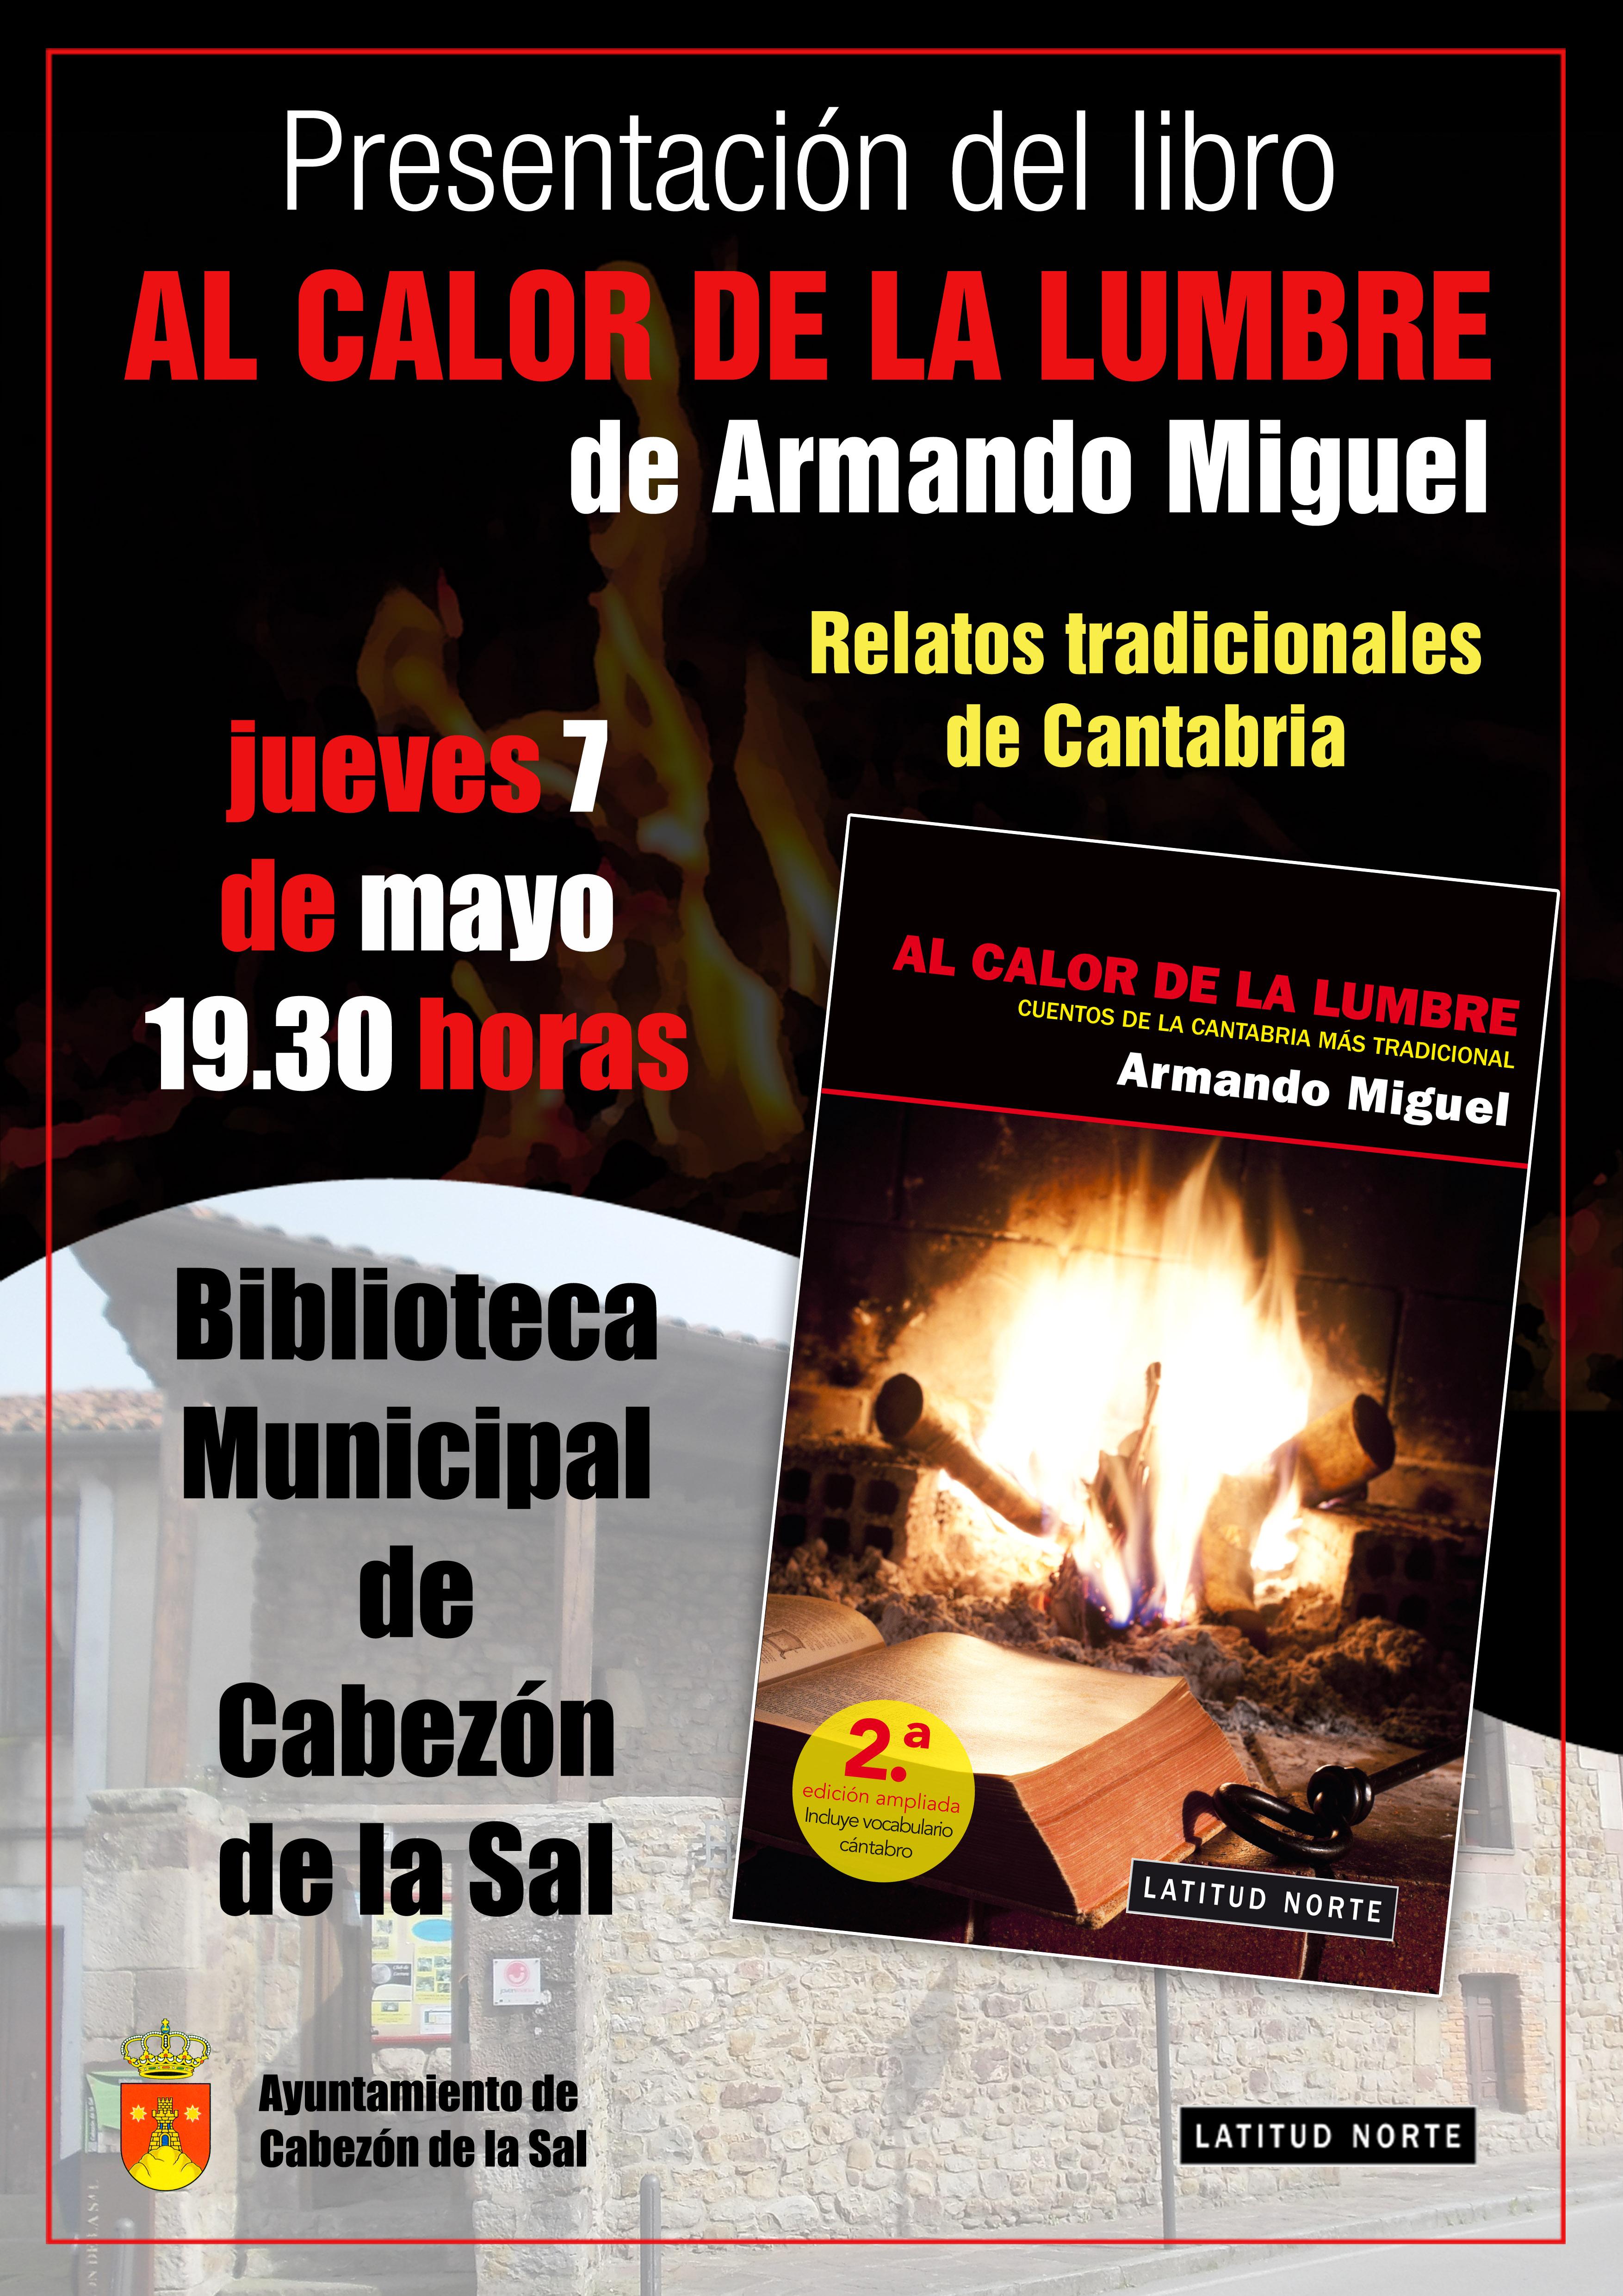 http://www.cabezondelasal.net/wp-content/uploads/2015/05/cartel-presentacion-cabezon-1.jpg